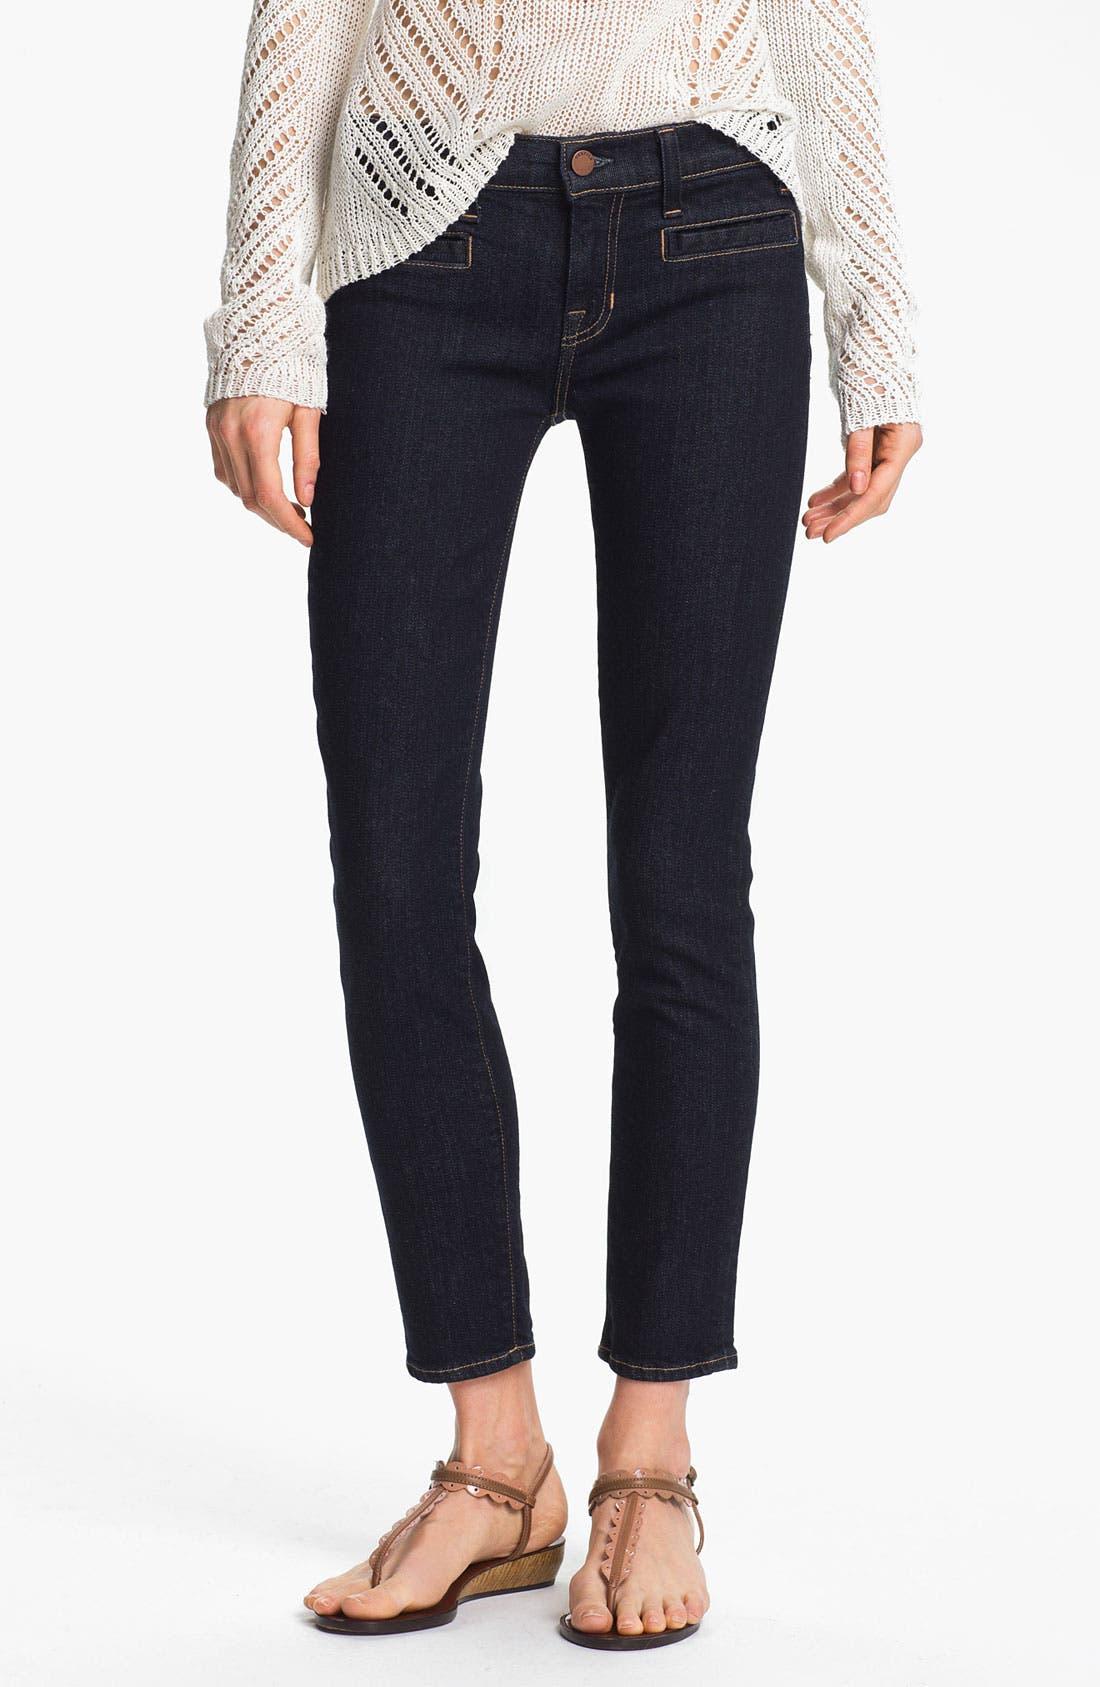 Main Image - TEXTILE Elizabeth and James 'Tucker' Skinny Jeans